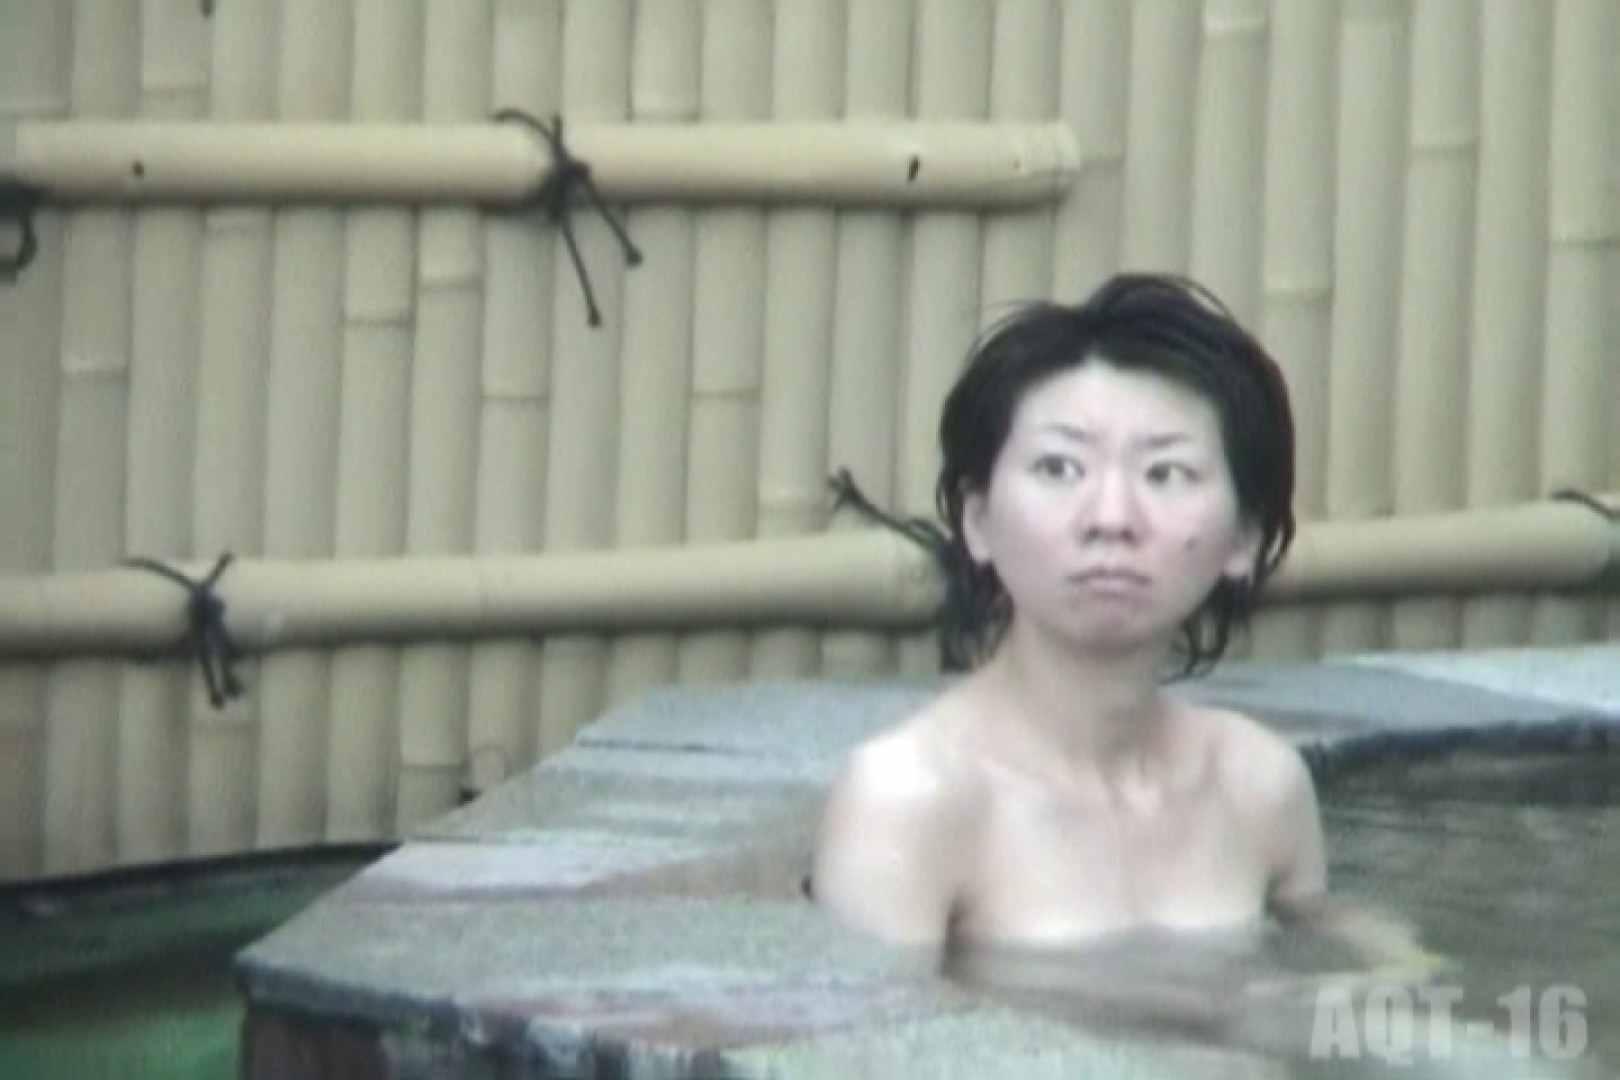 Aquaな露天風呂Vol.842 盗撮  44連発 15